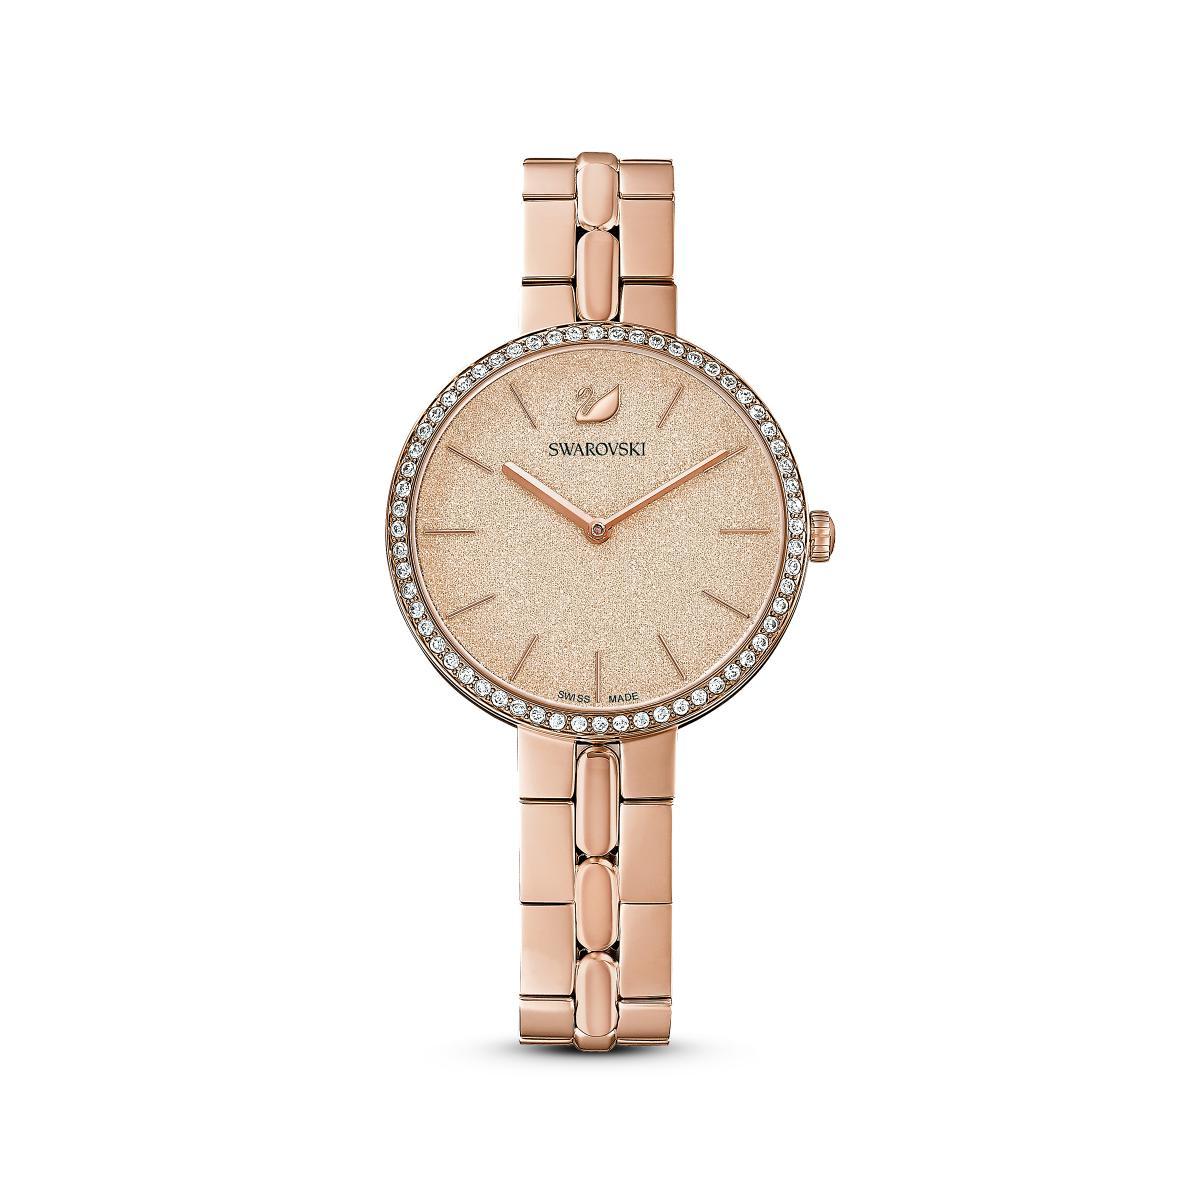 MONTRES 5517800 - COSMOPOLITAN - Swarovski montres - Modalova